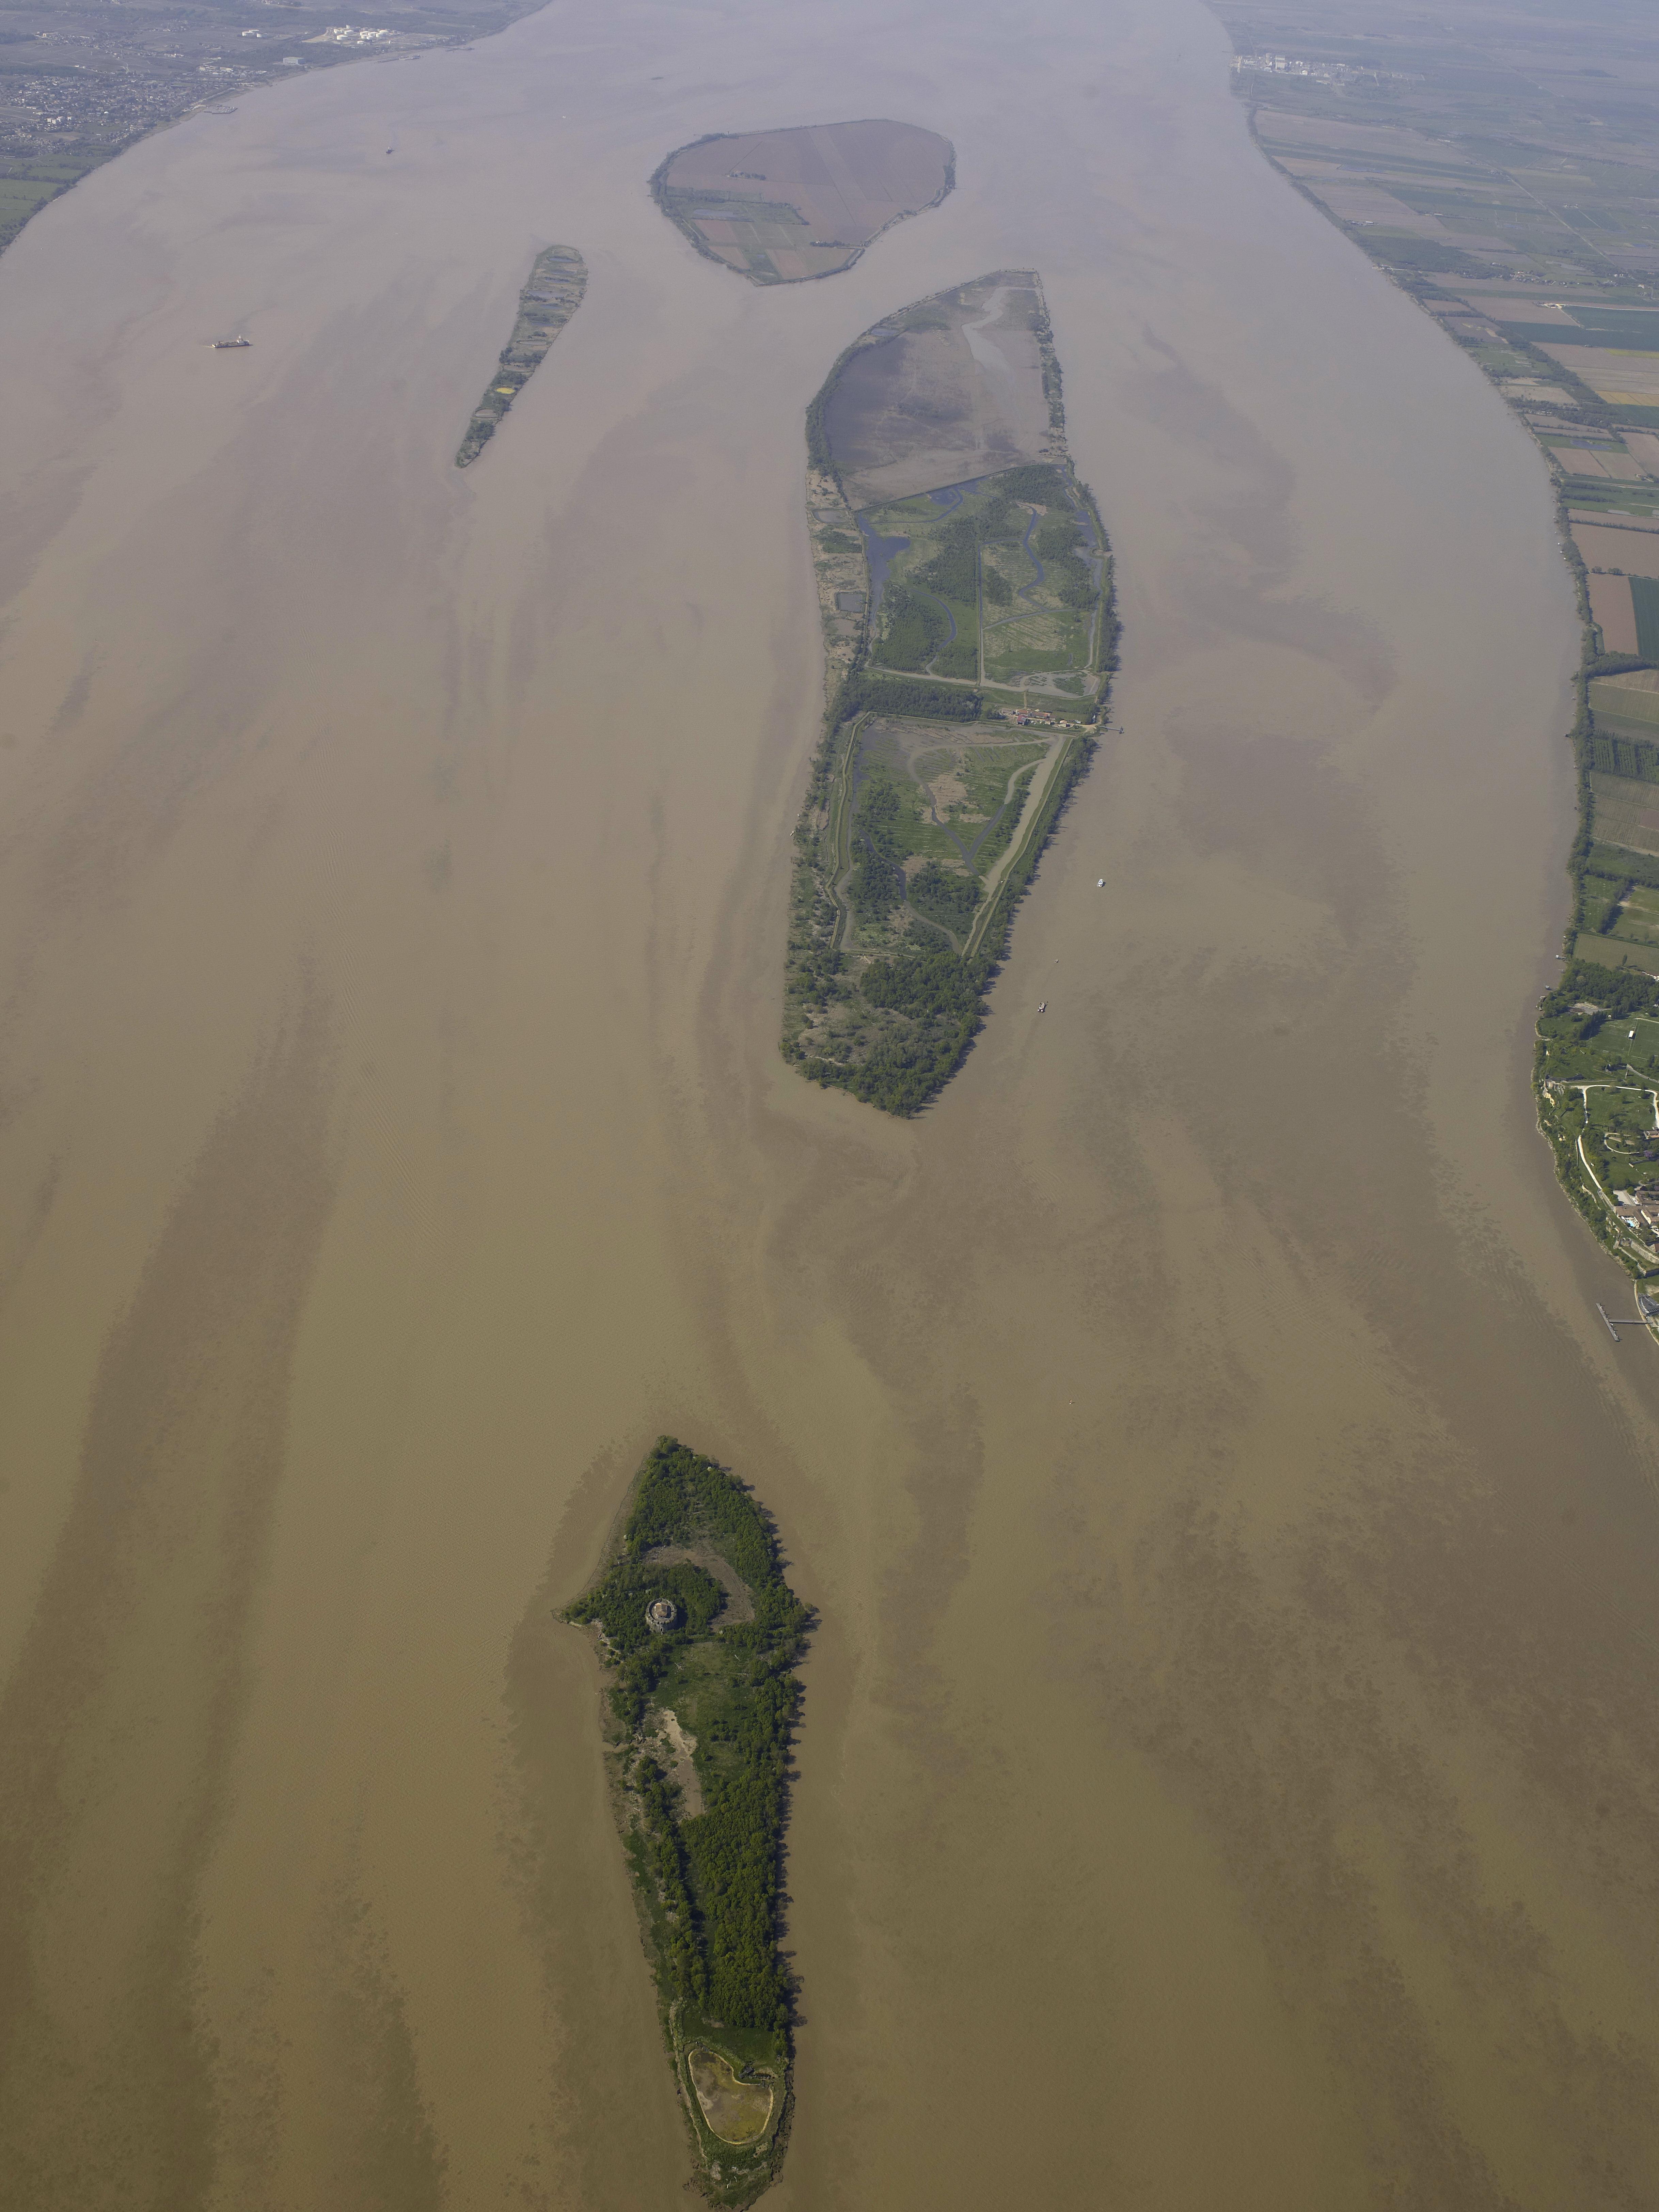 SCOT de la Haute Gironde Blaye-Estuaire